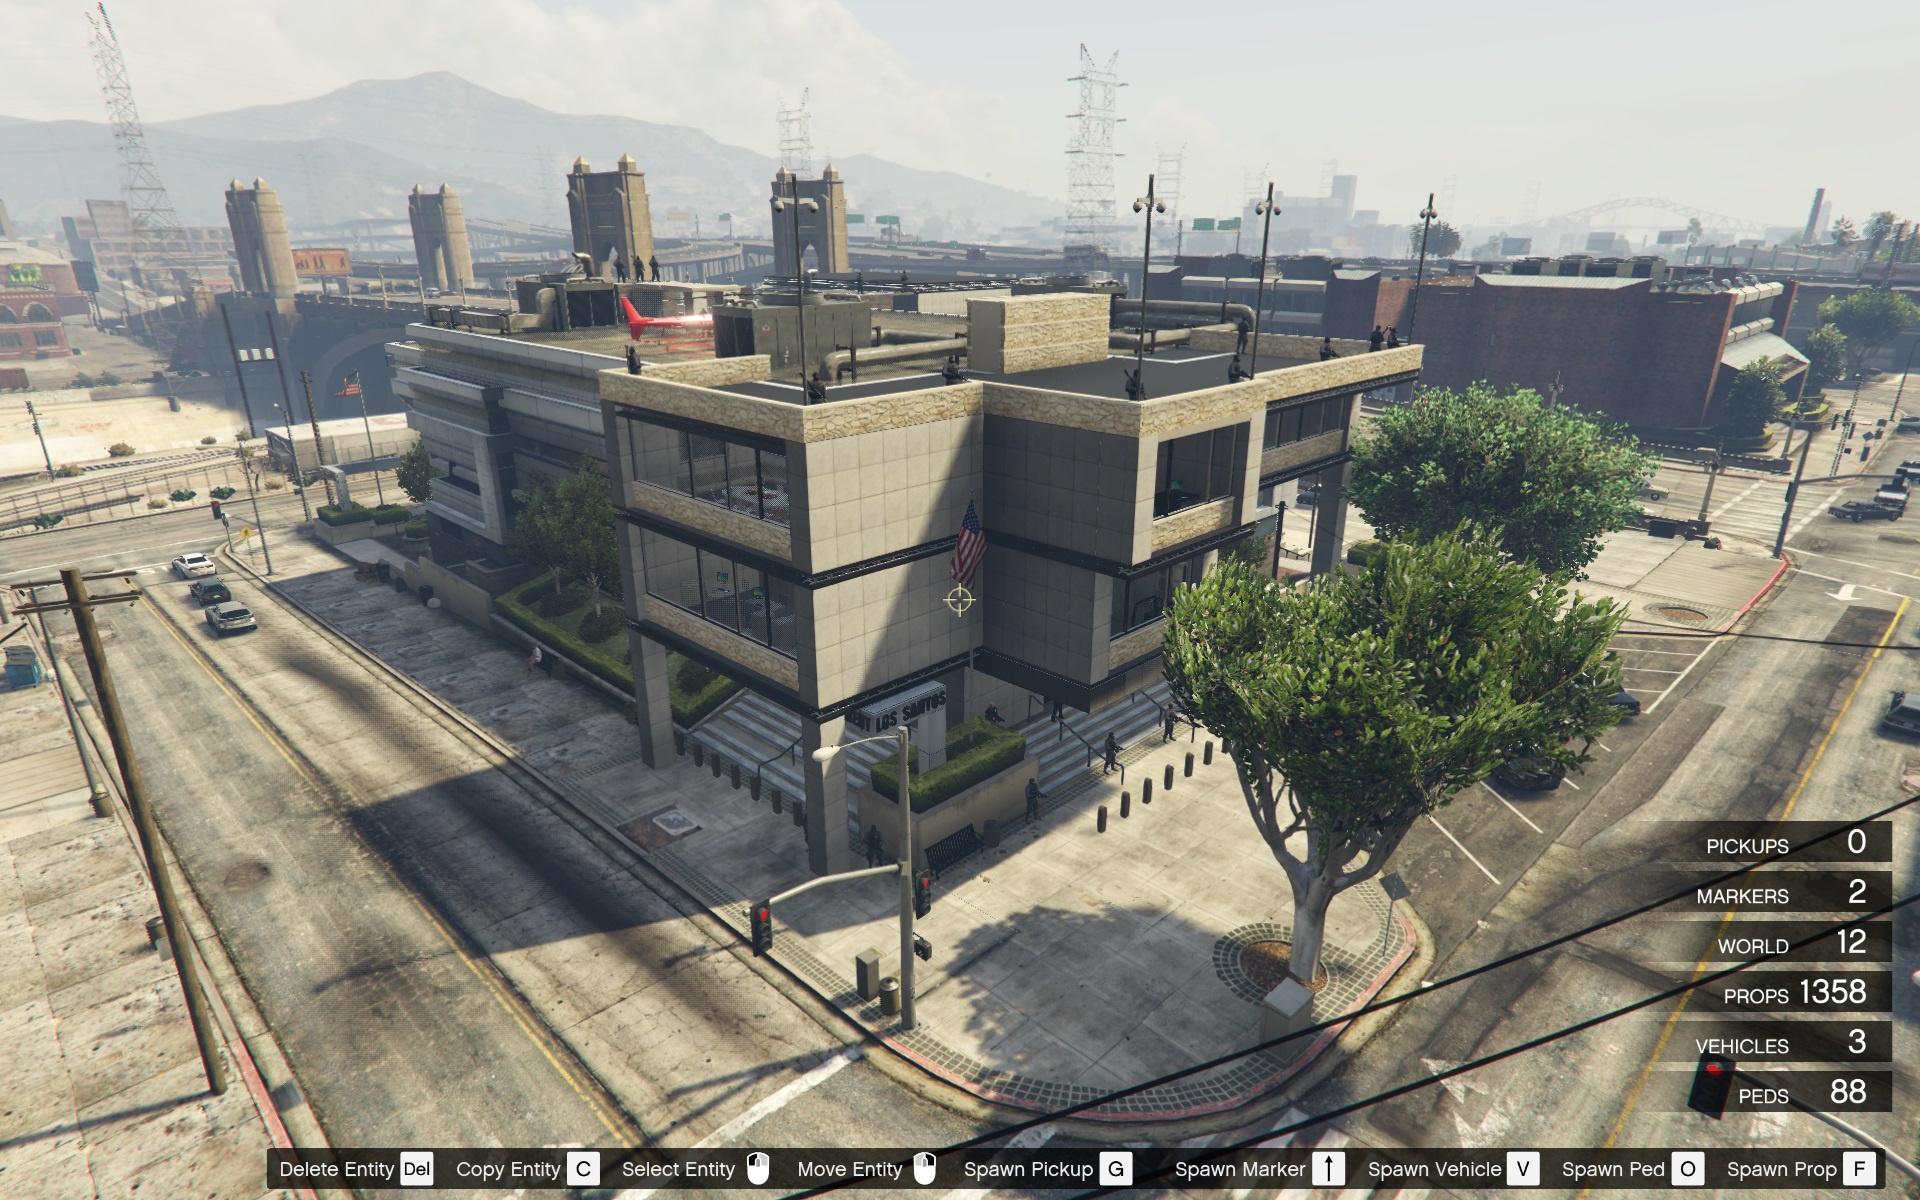 Mission row police station gta 5 location